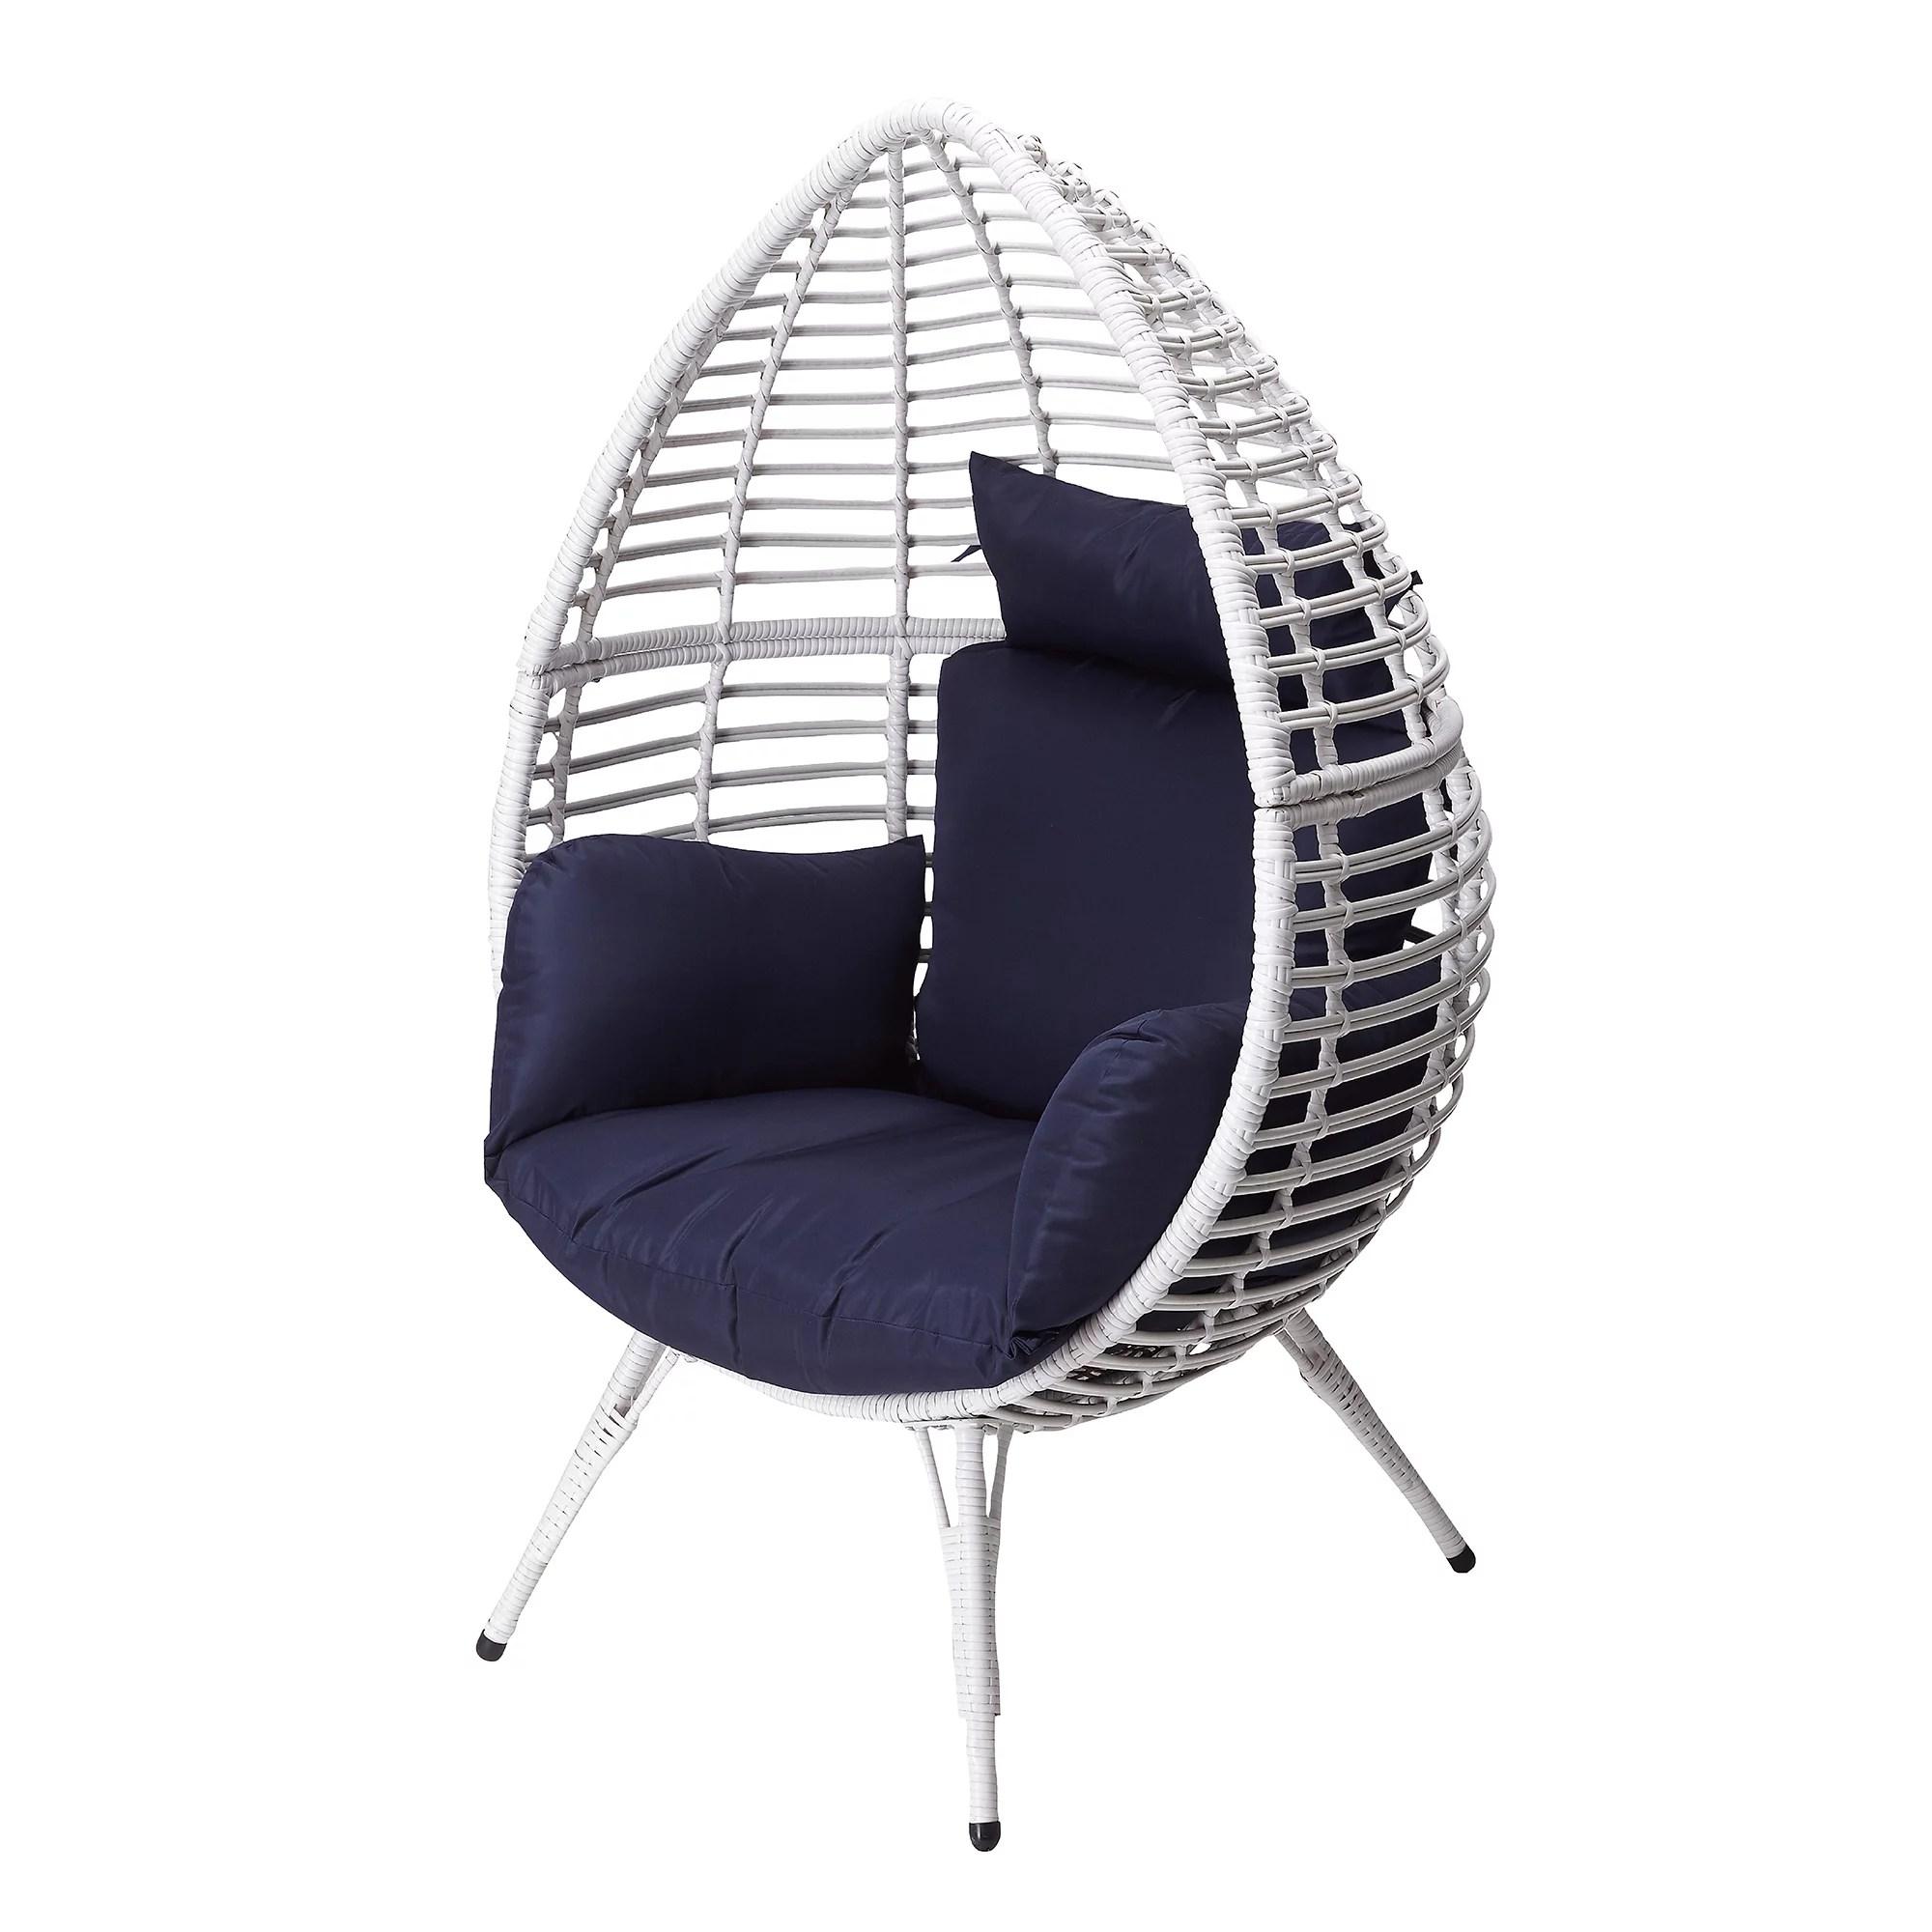 peaktop patio wicker egg chair white